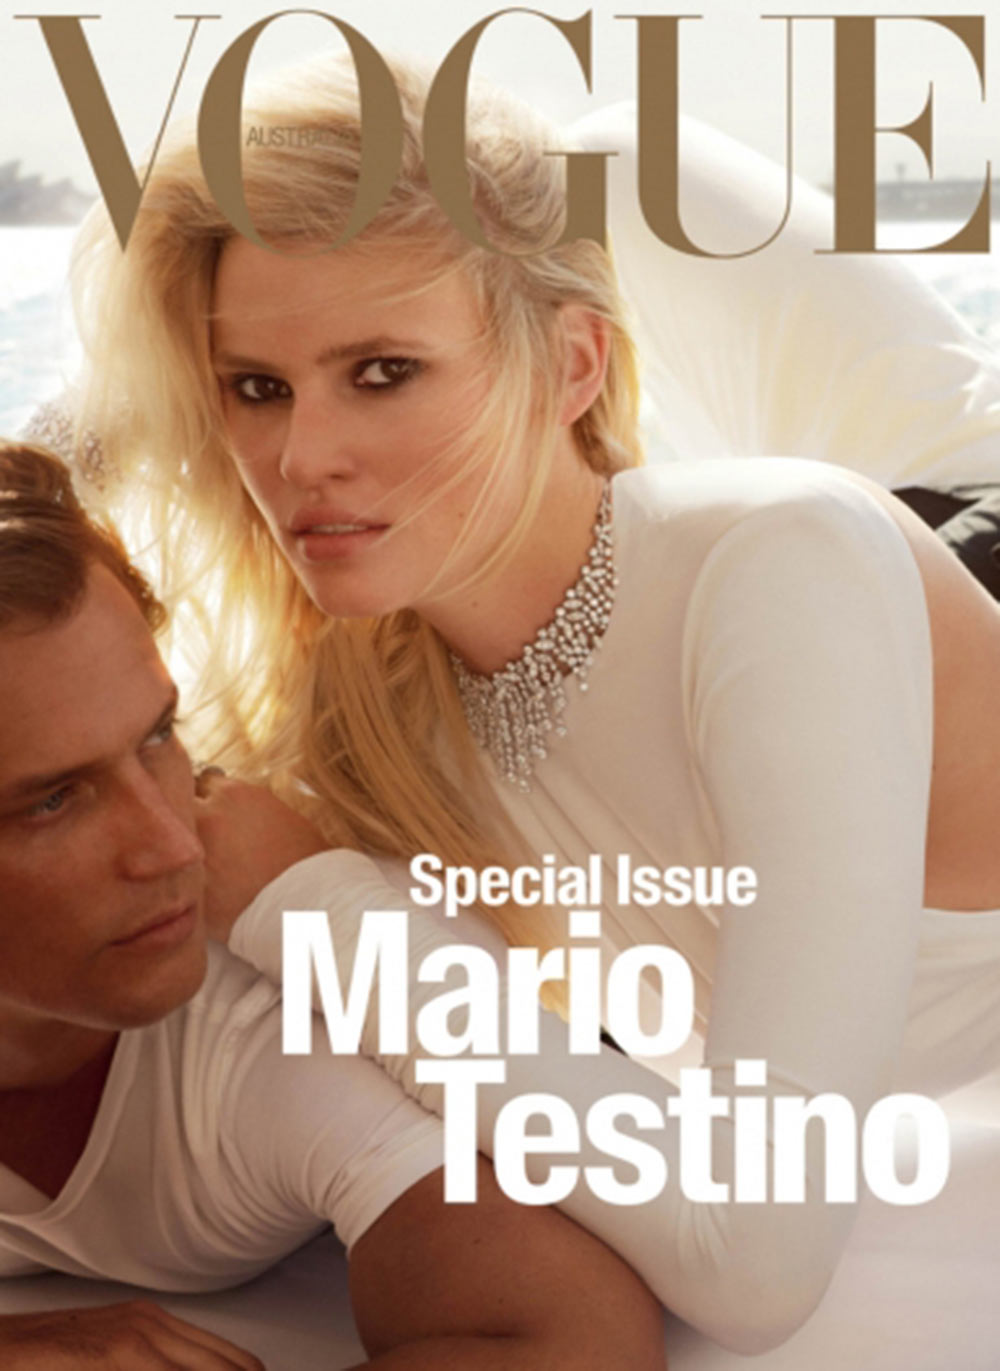 LJ_Vogue_0416_cover.jpg